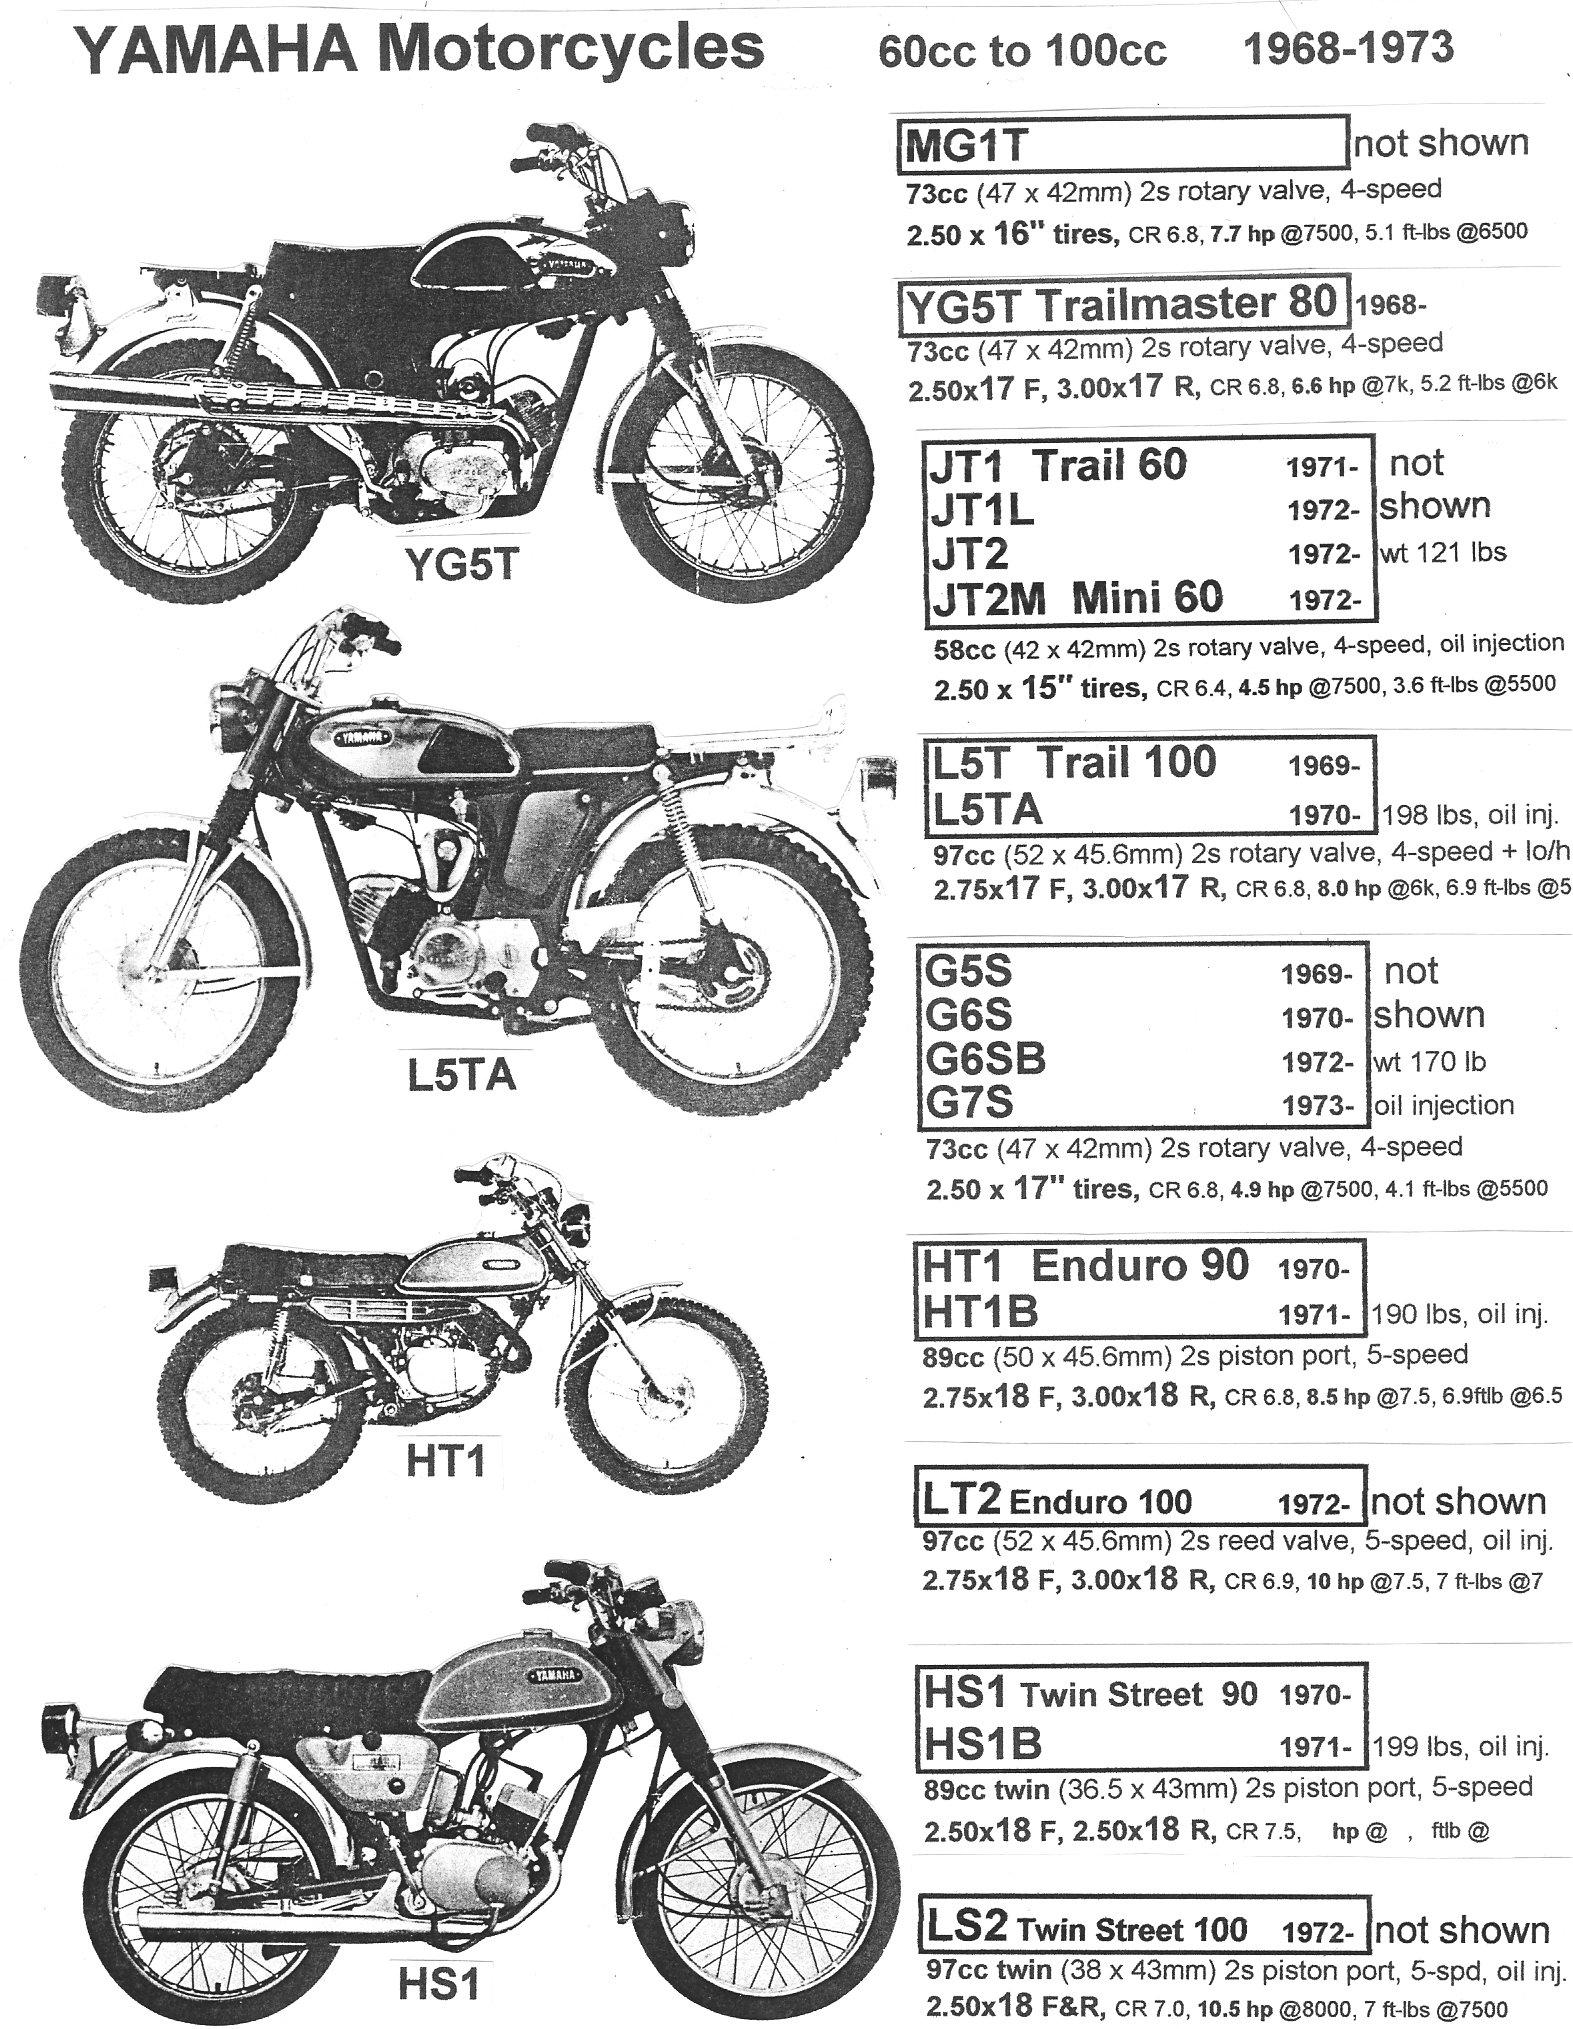 1966 Yamaha YJ2 Riverside 60cc 2 Stroke Single w 4spd